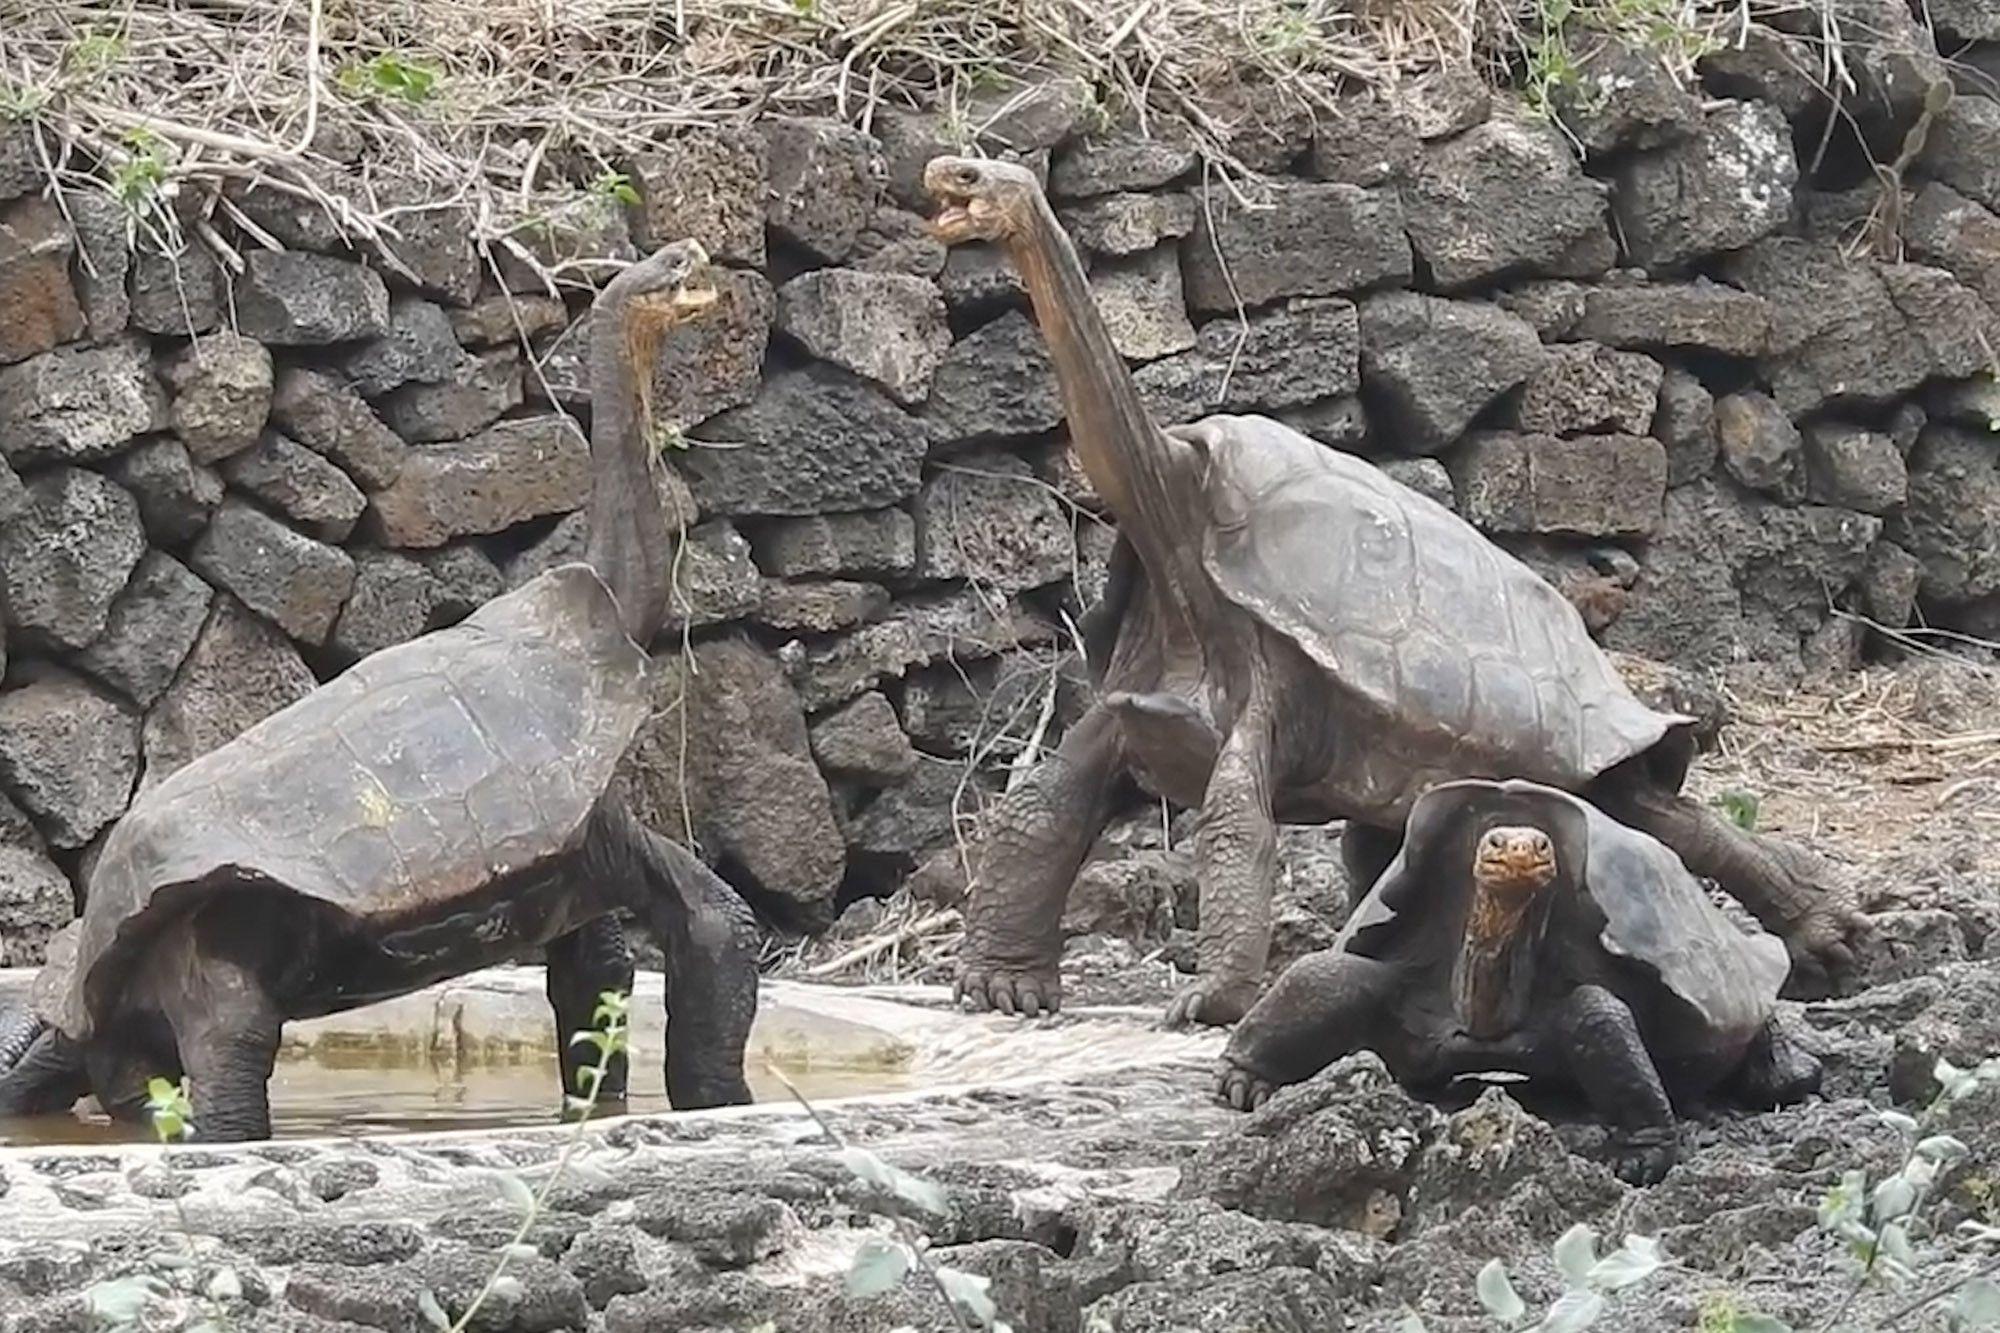 Gallapagos Tortoise